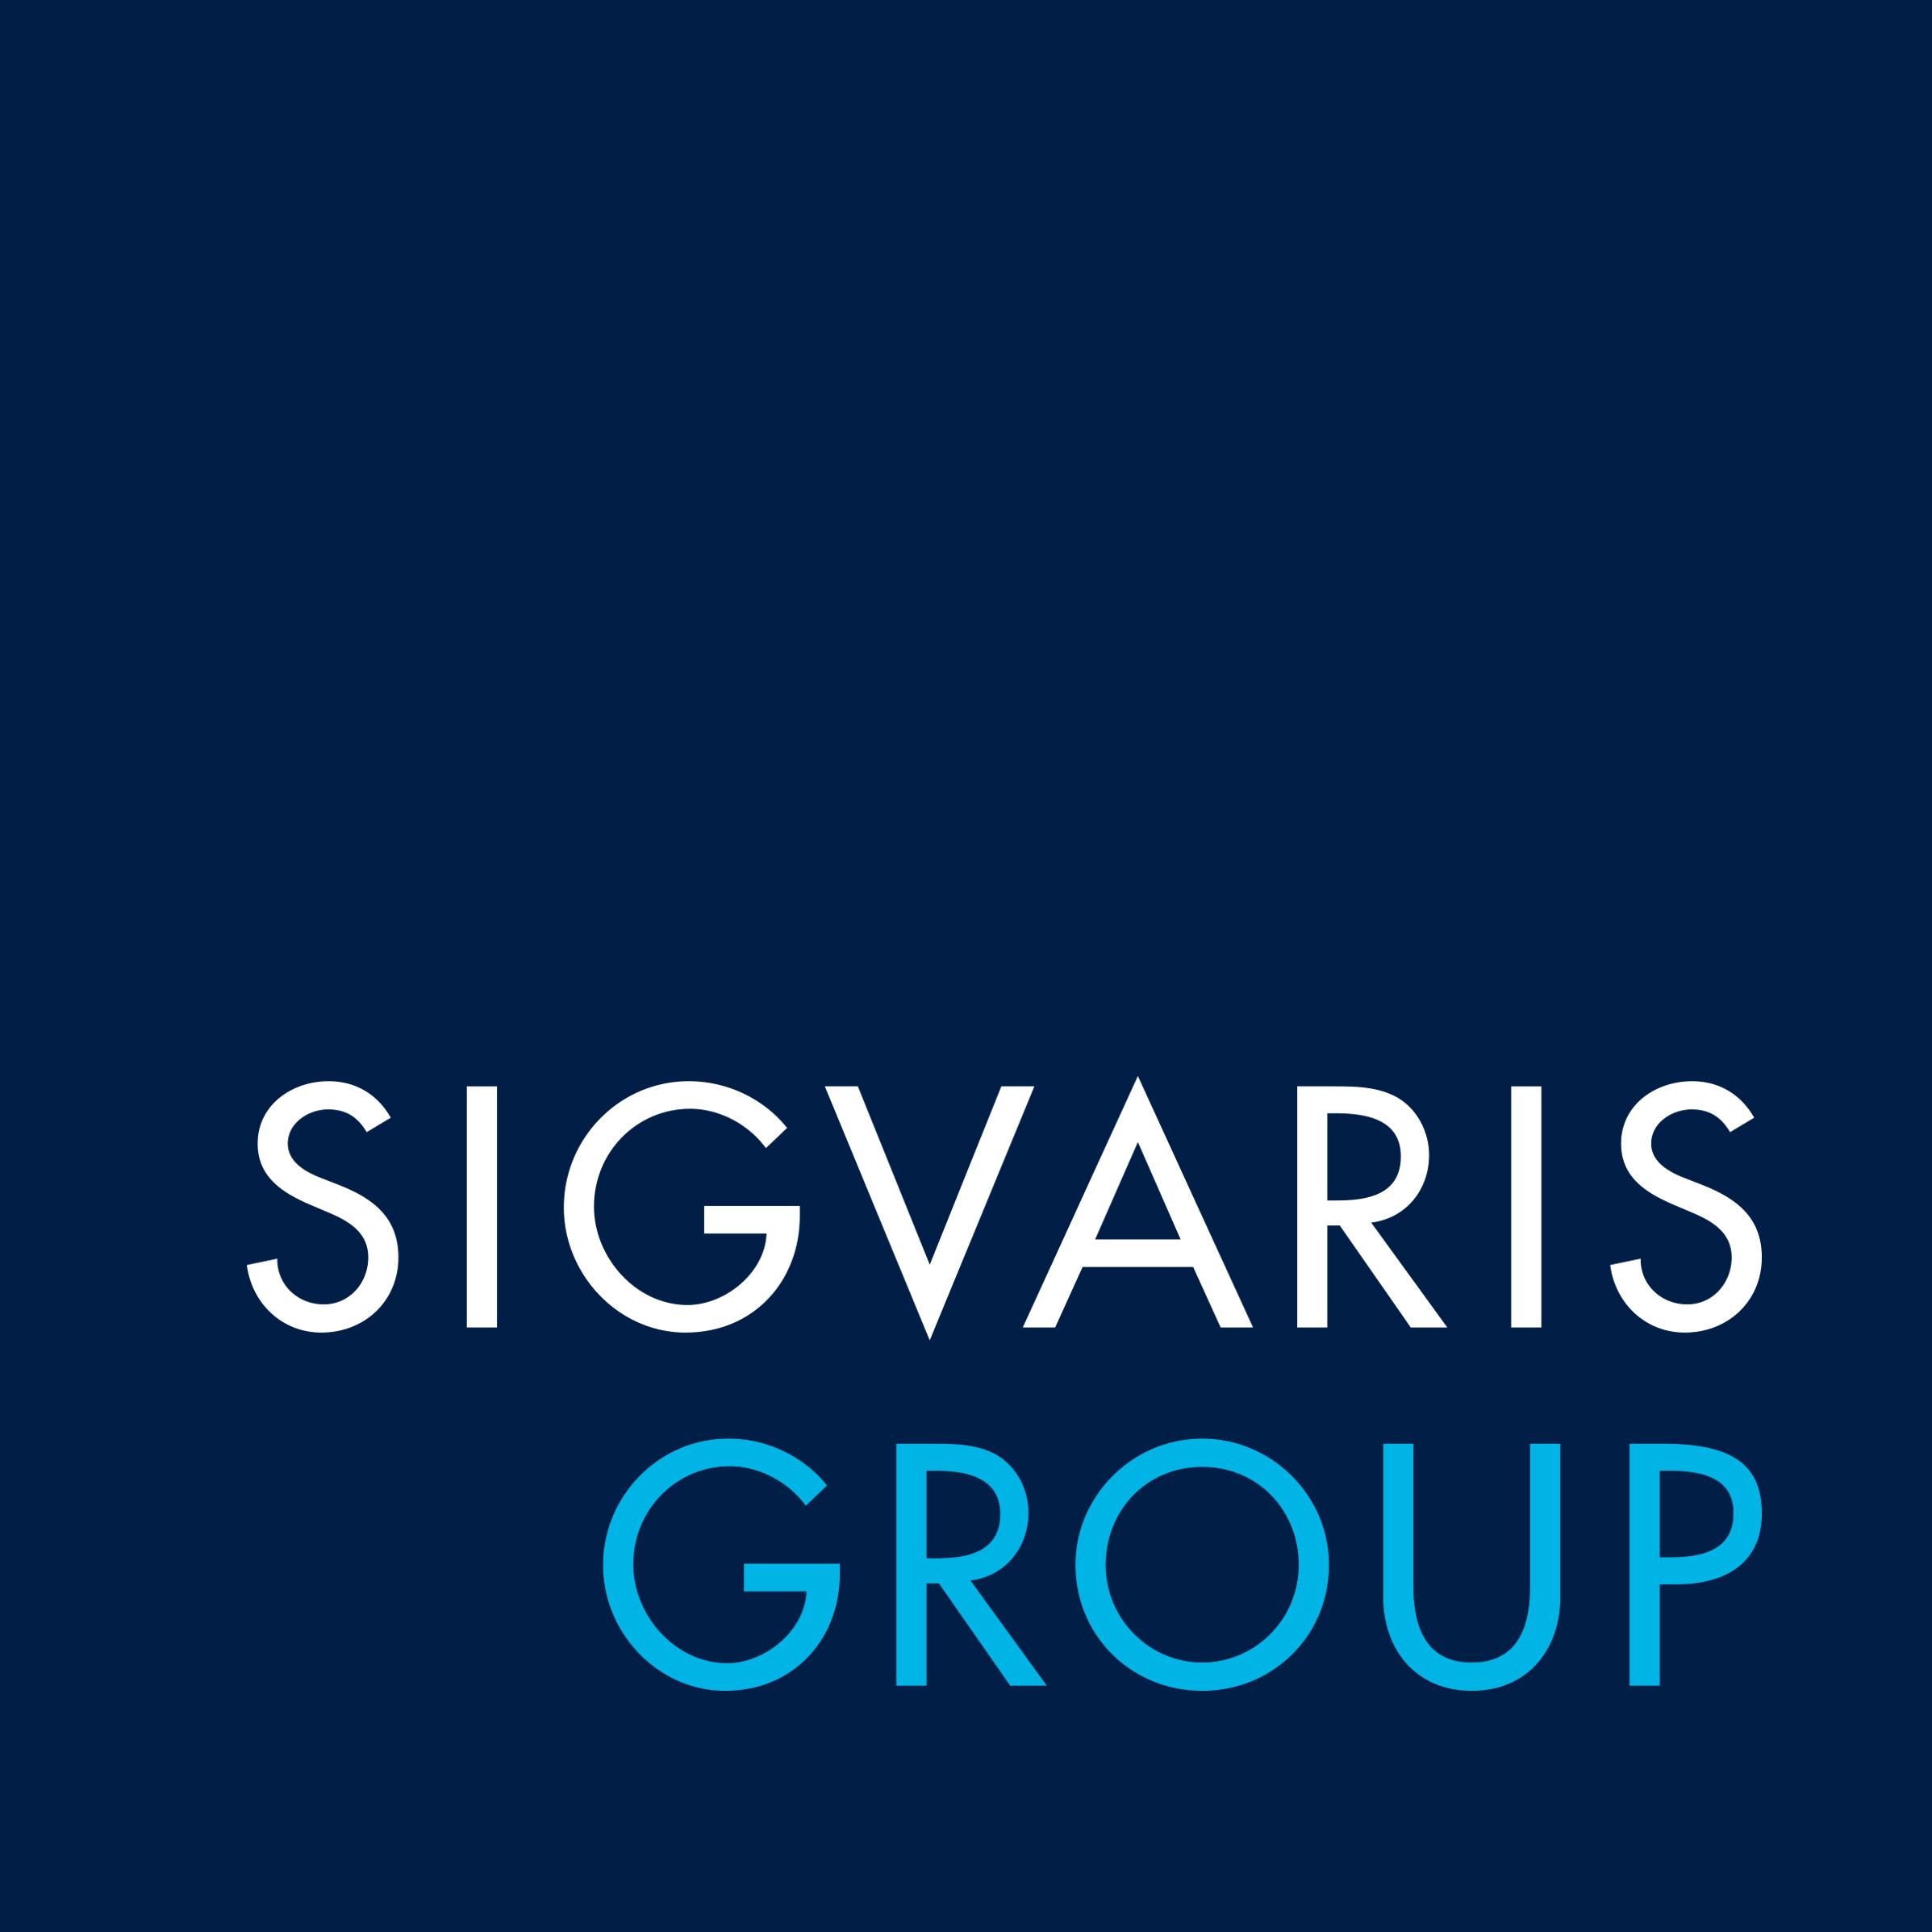 Sigvaris Group